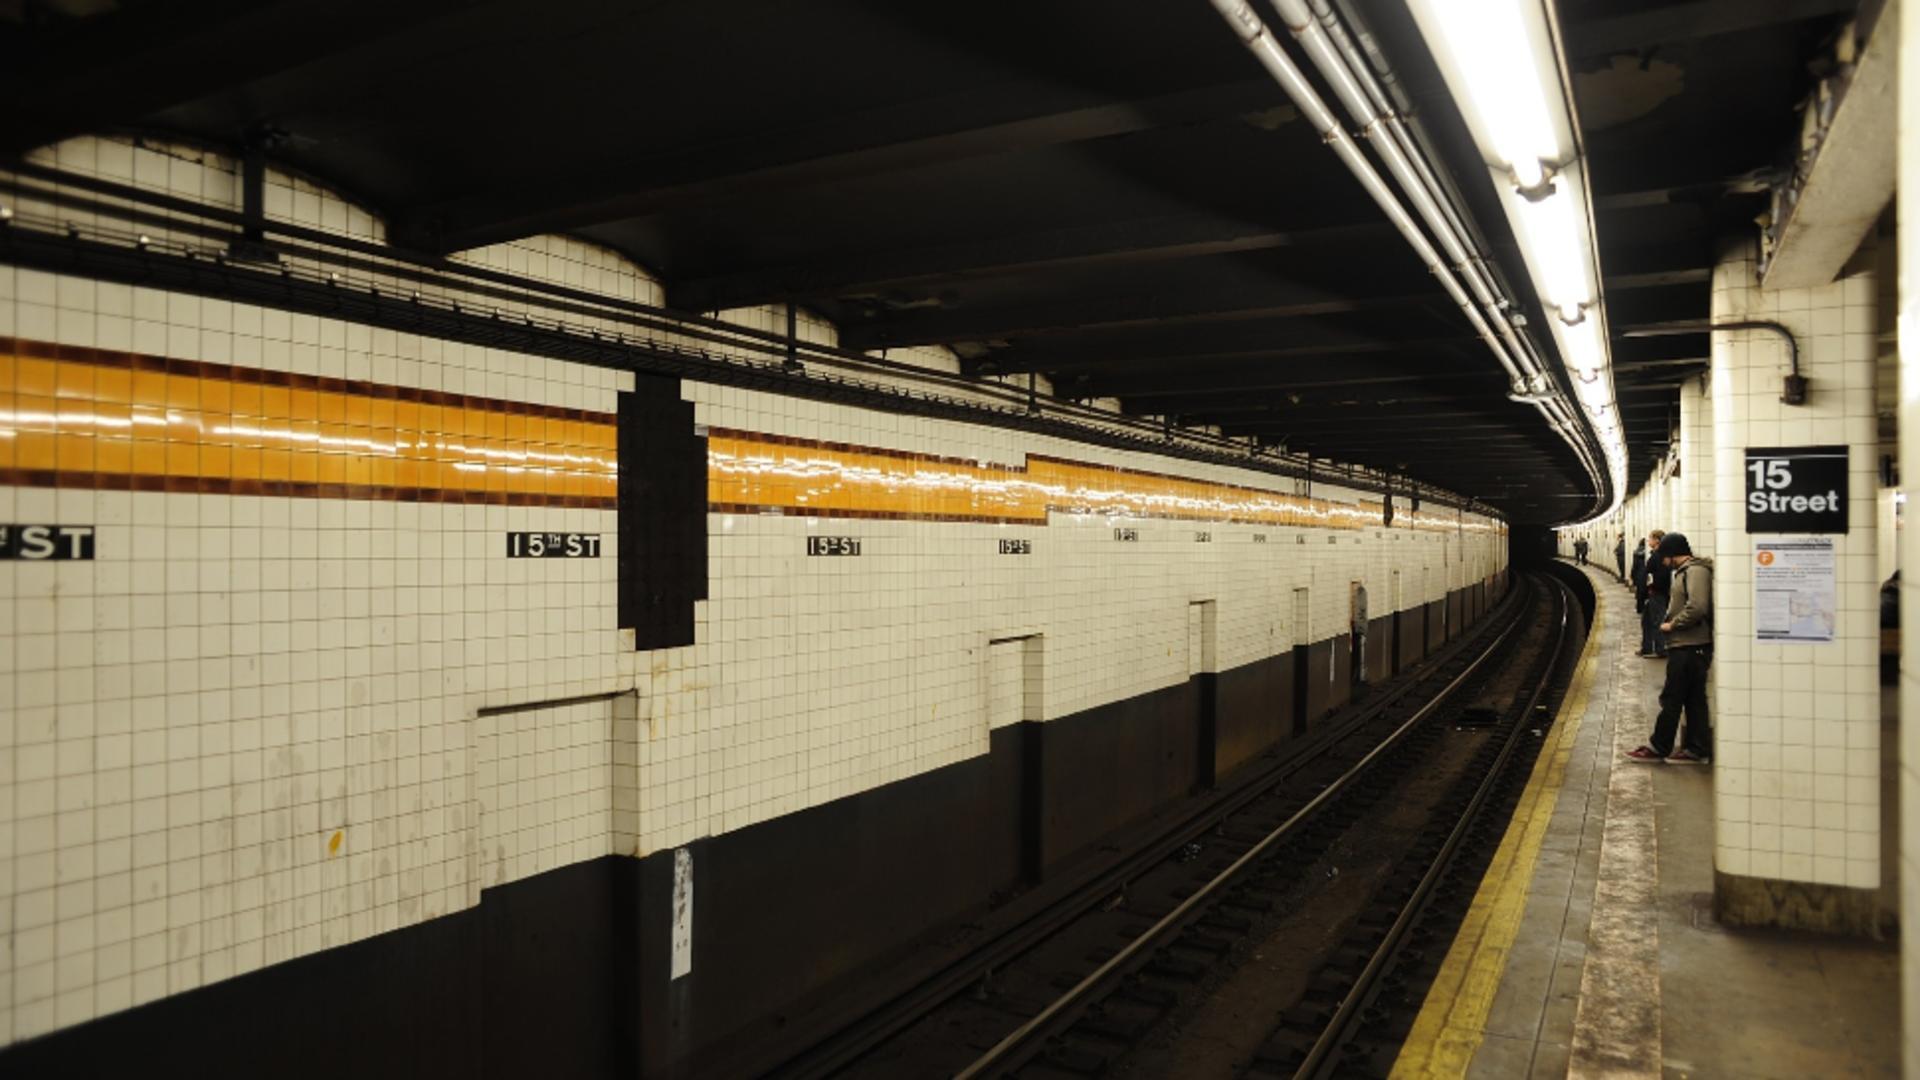 Atac metrou din New York  - sentinta